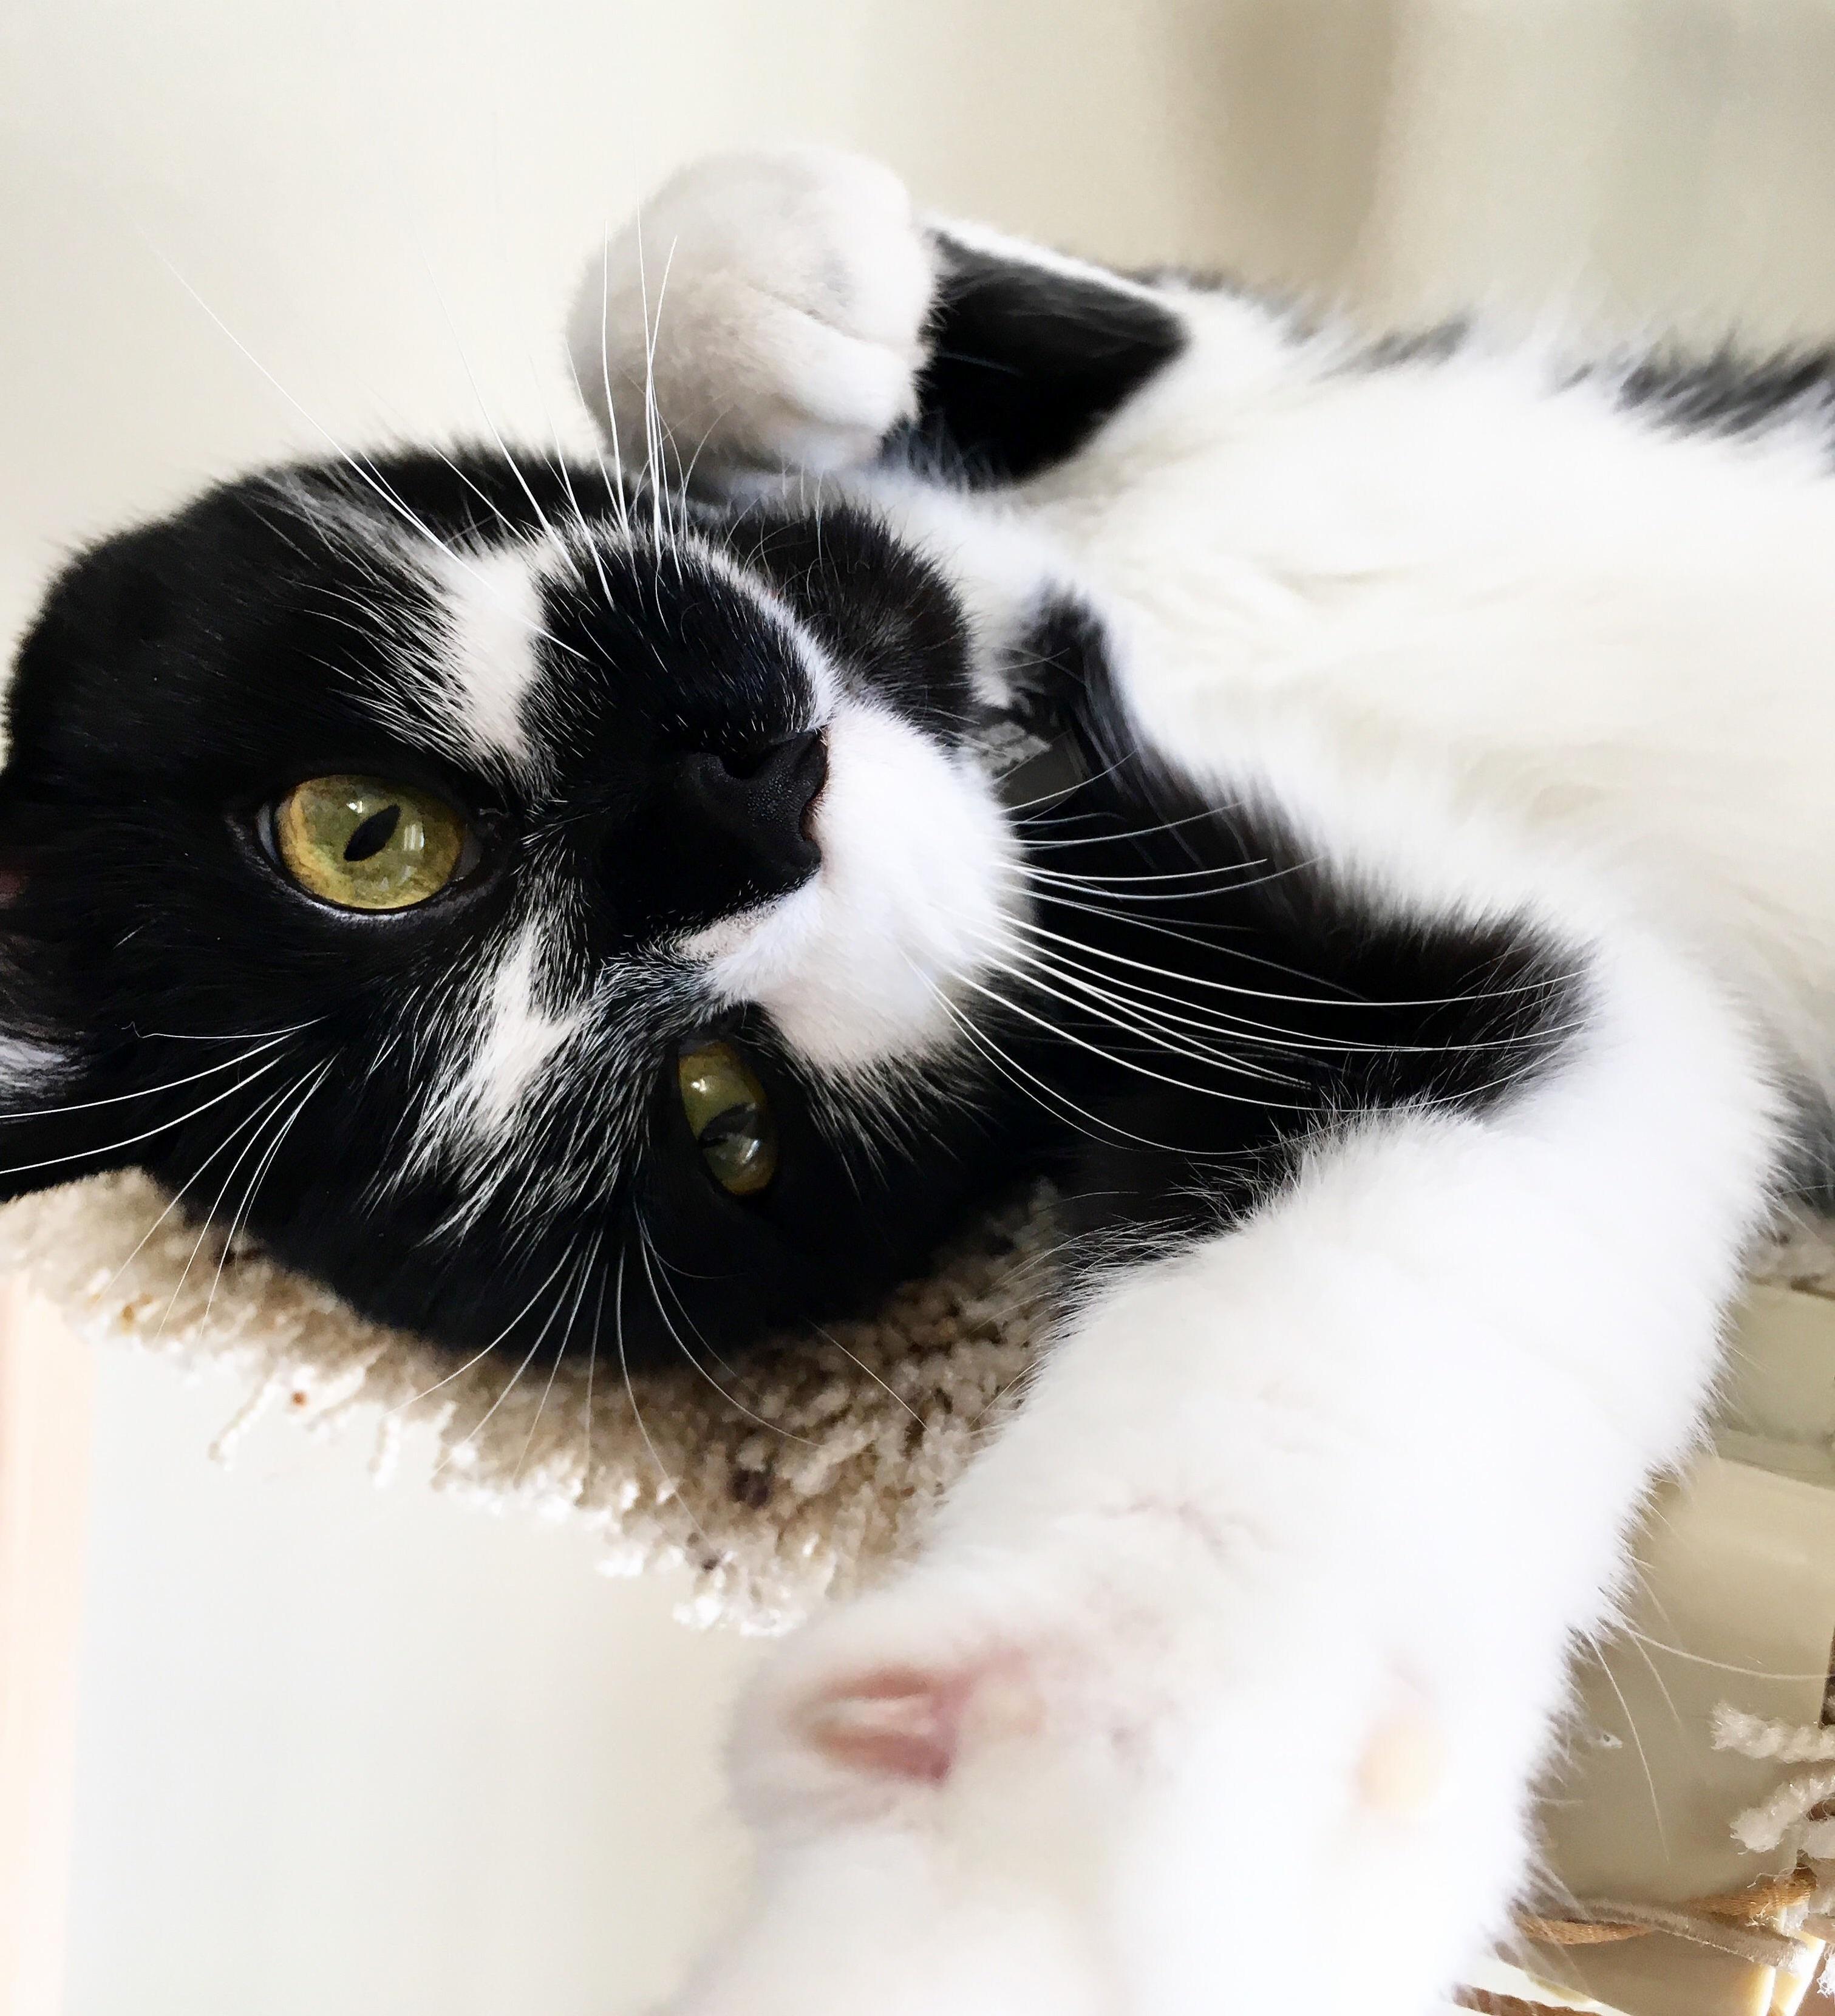 Luna the most photogenic kitty cat.